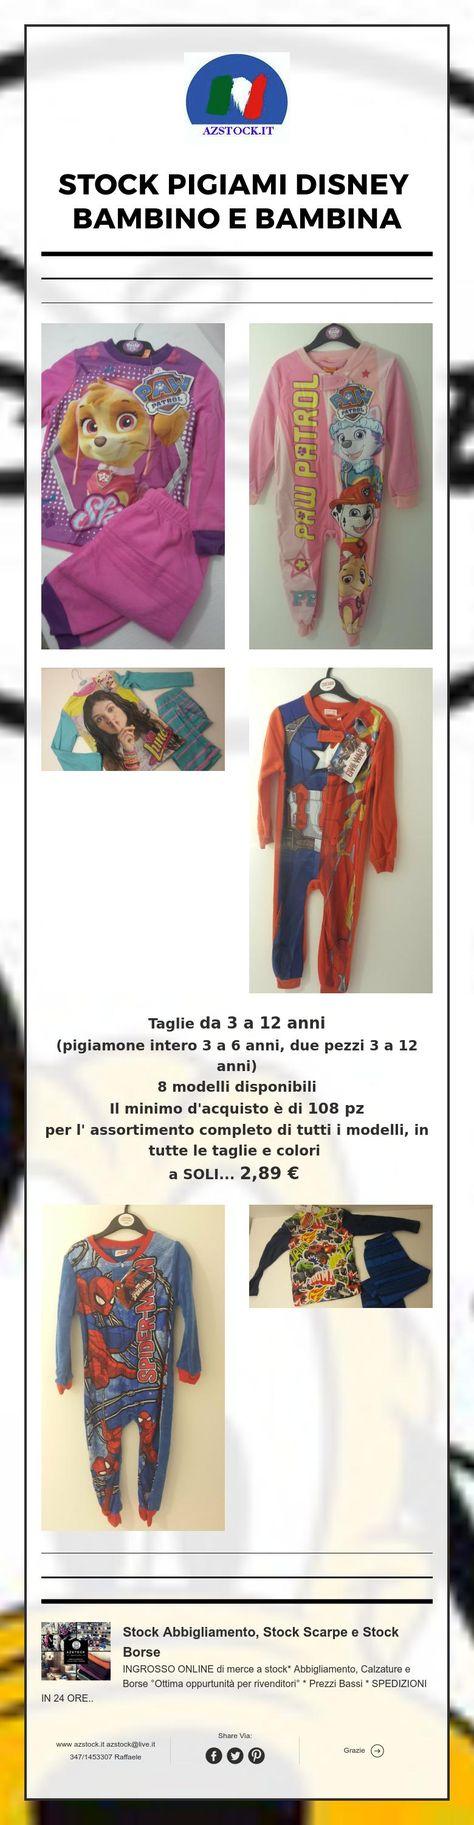 The 34 best Cose da indossare images on Pinterest  f5386abea43